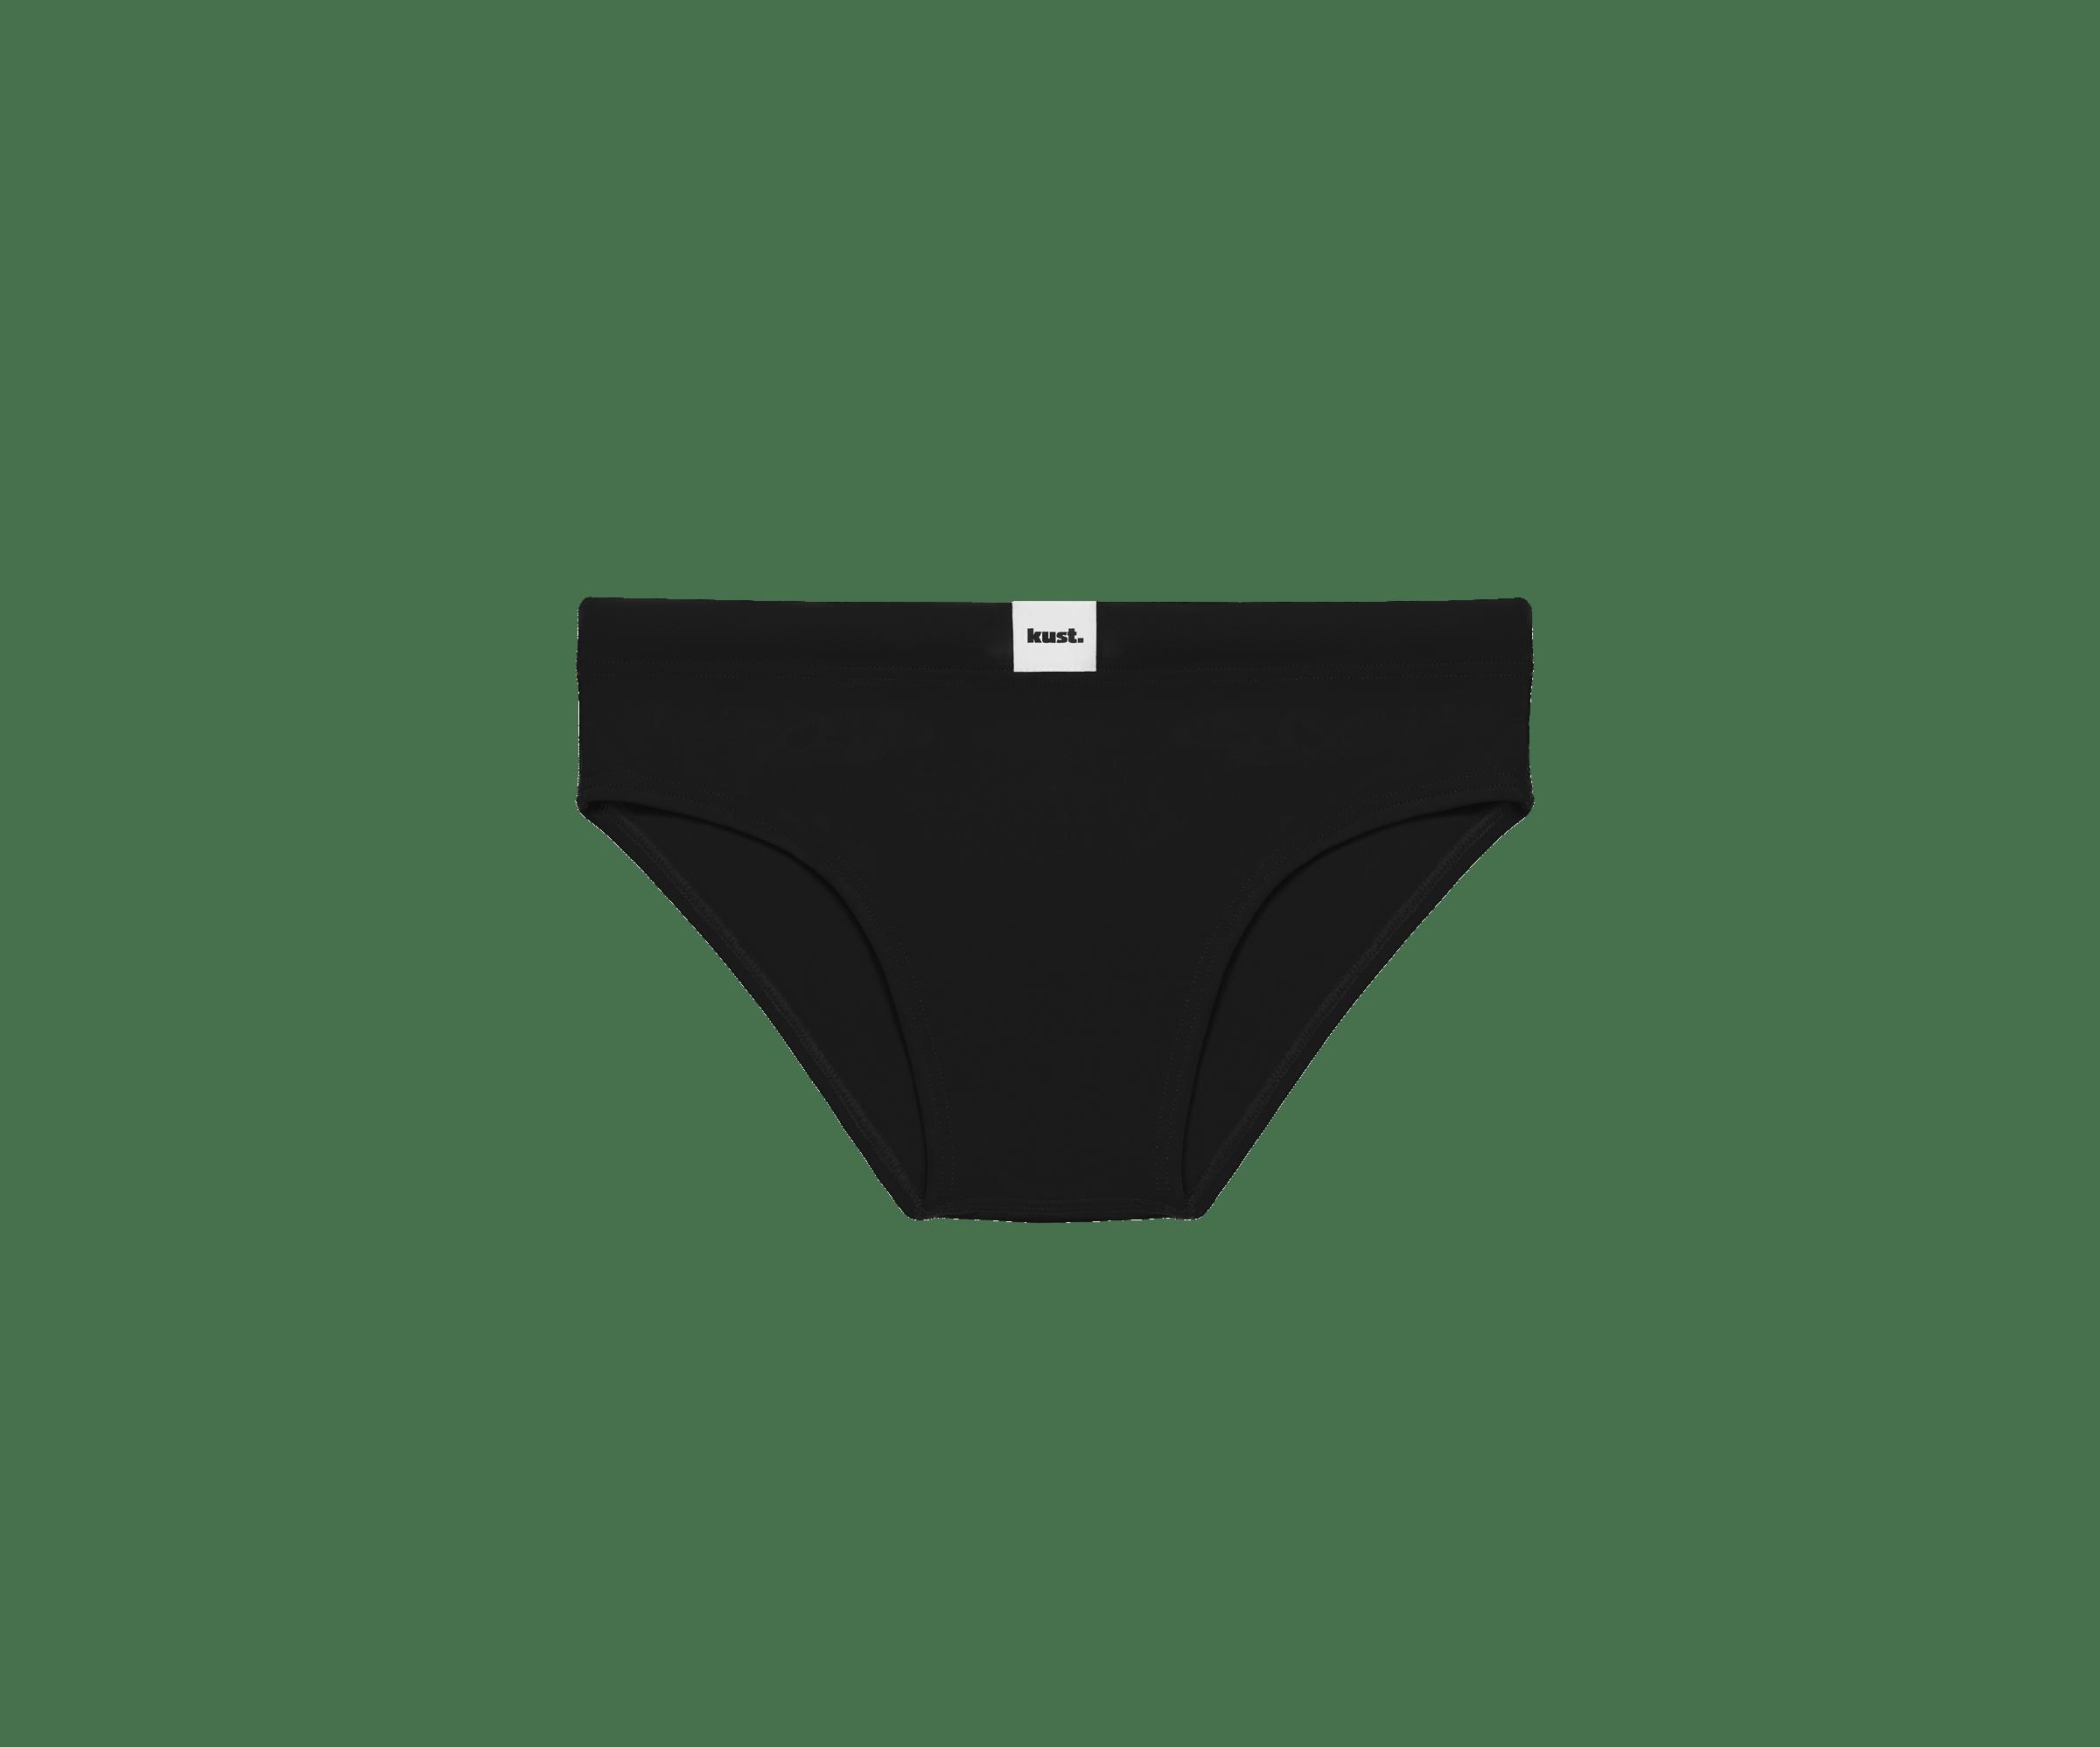 Costume da bagno slip nero Kust Swimwear, ideale per gli sportivi